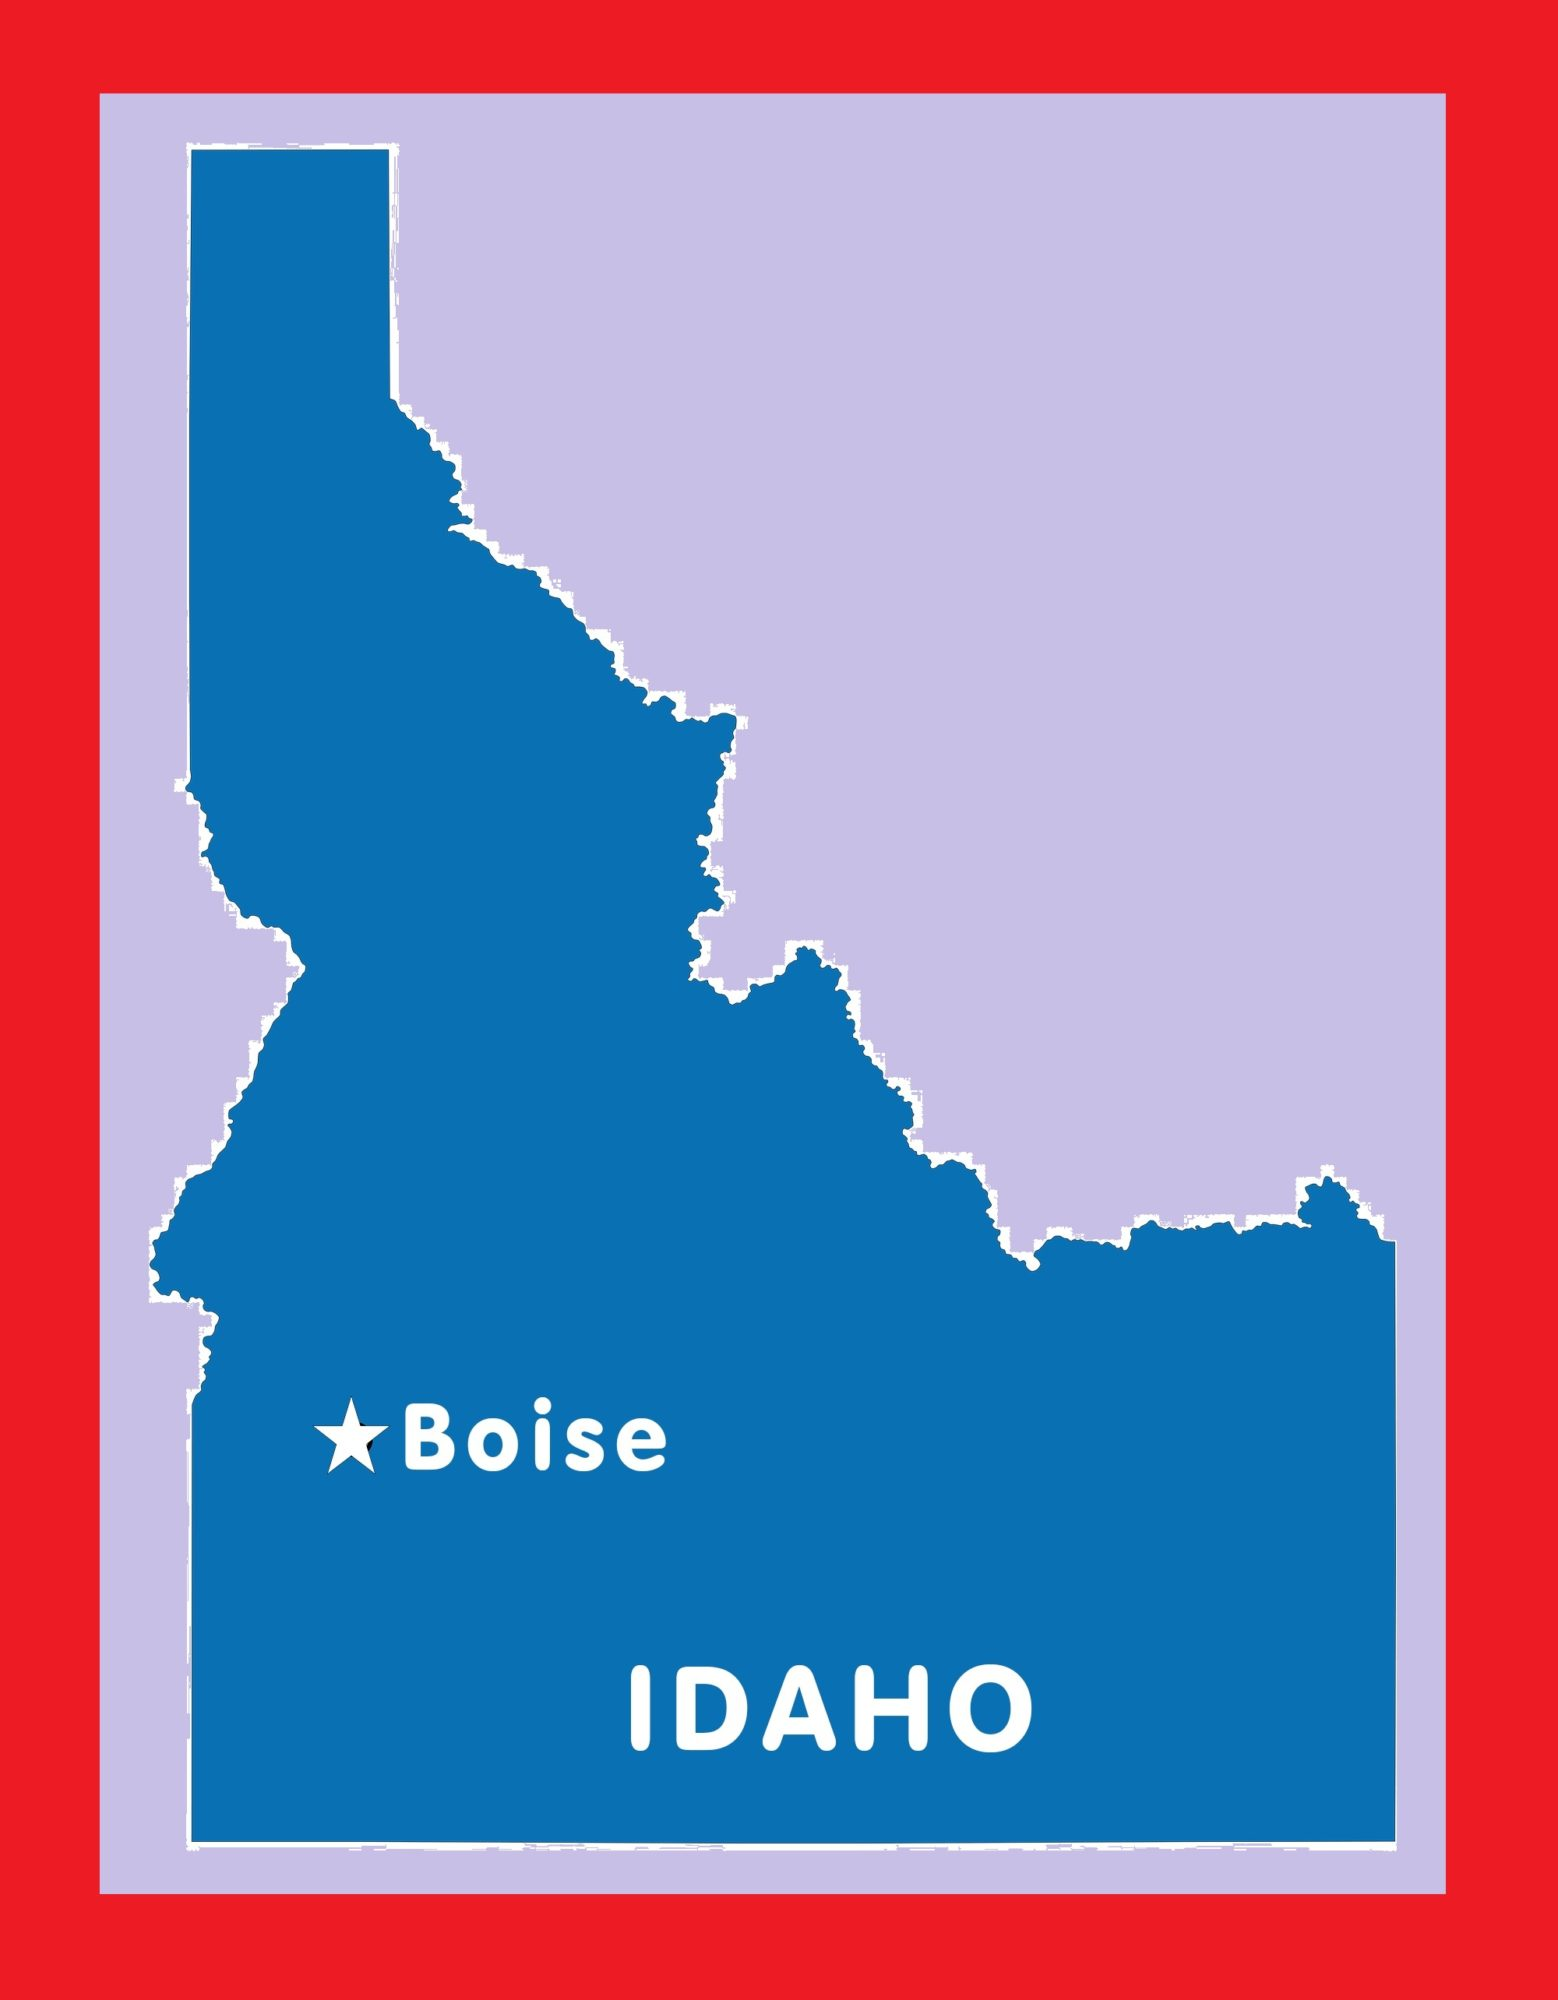 Idaho Capital Map | Large Printable and Standard Map 10